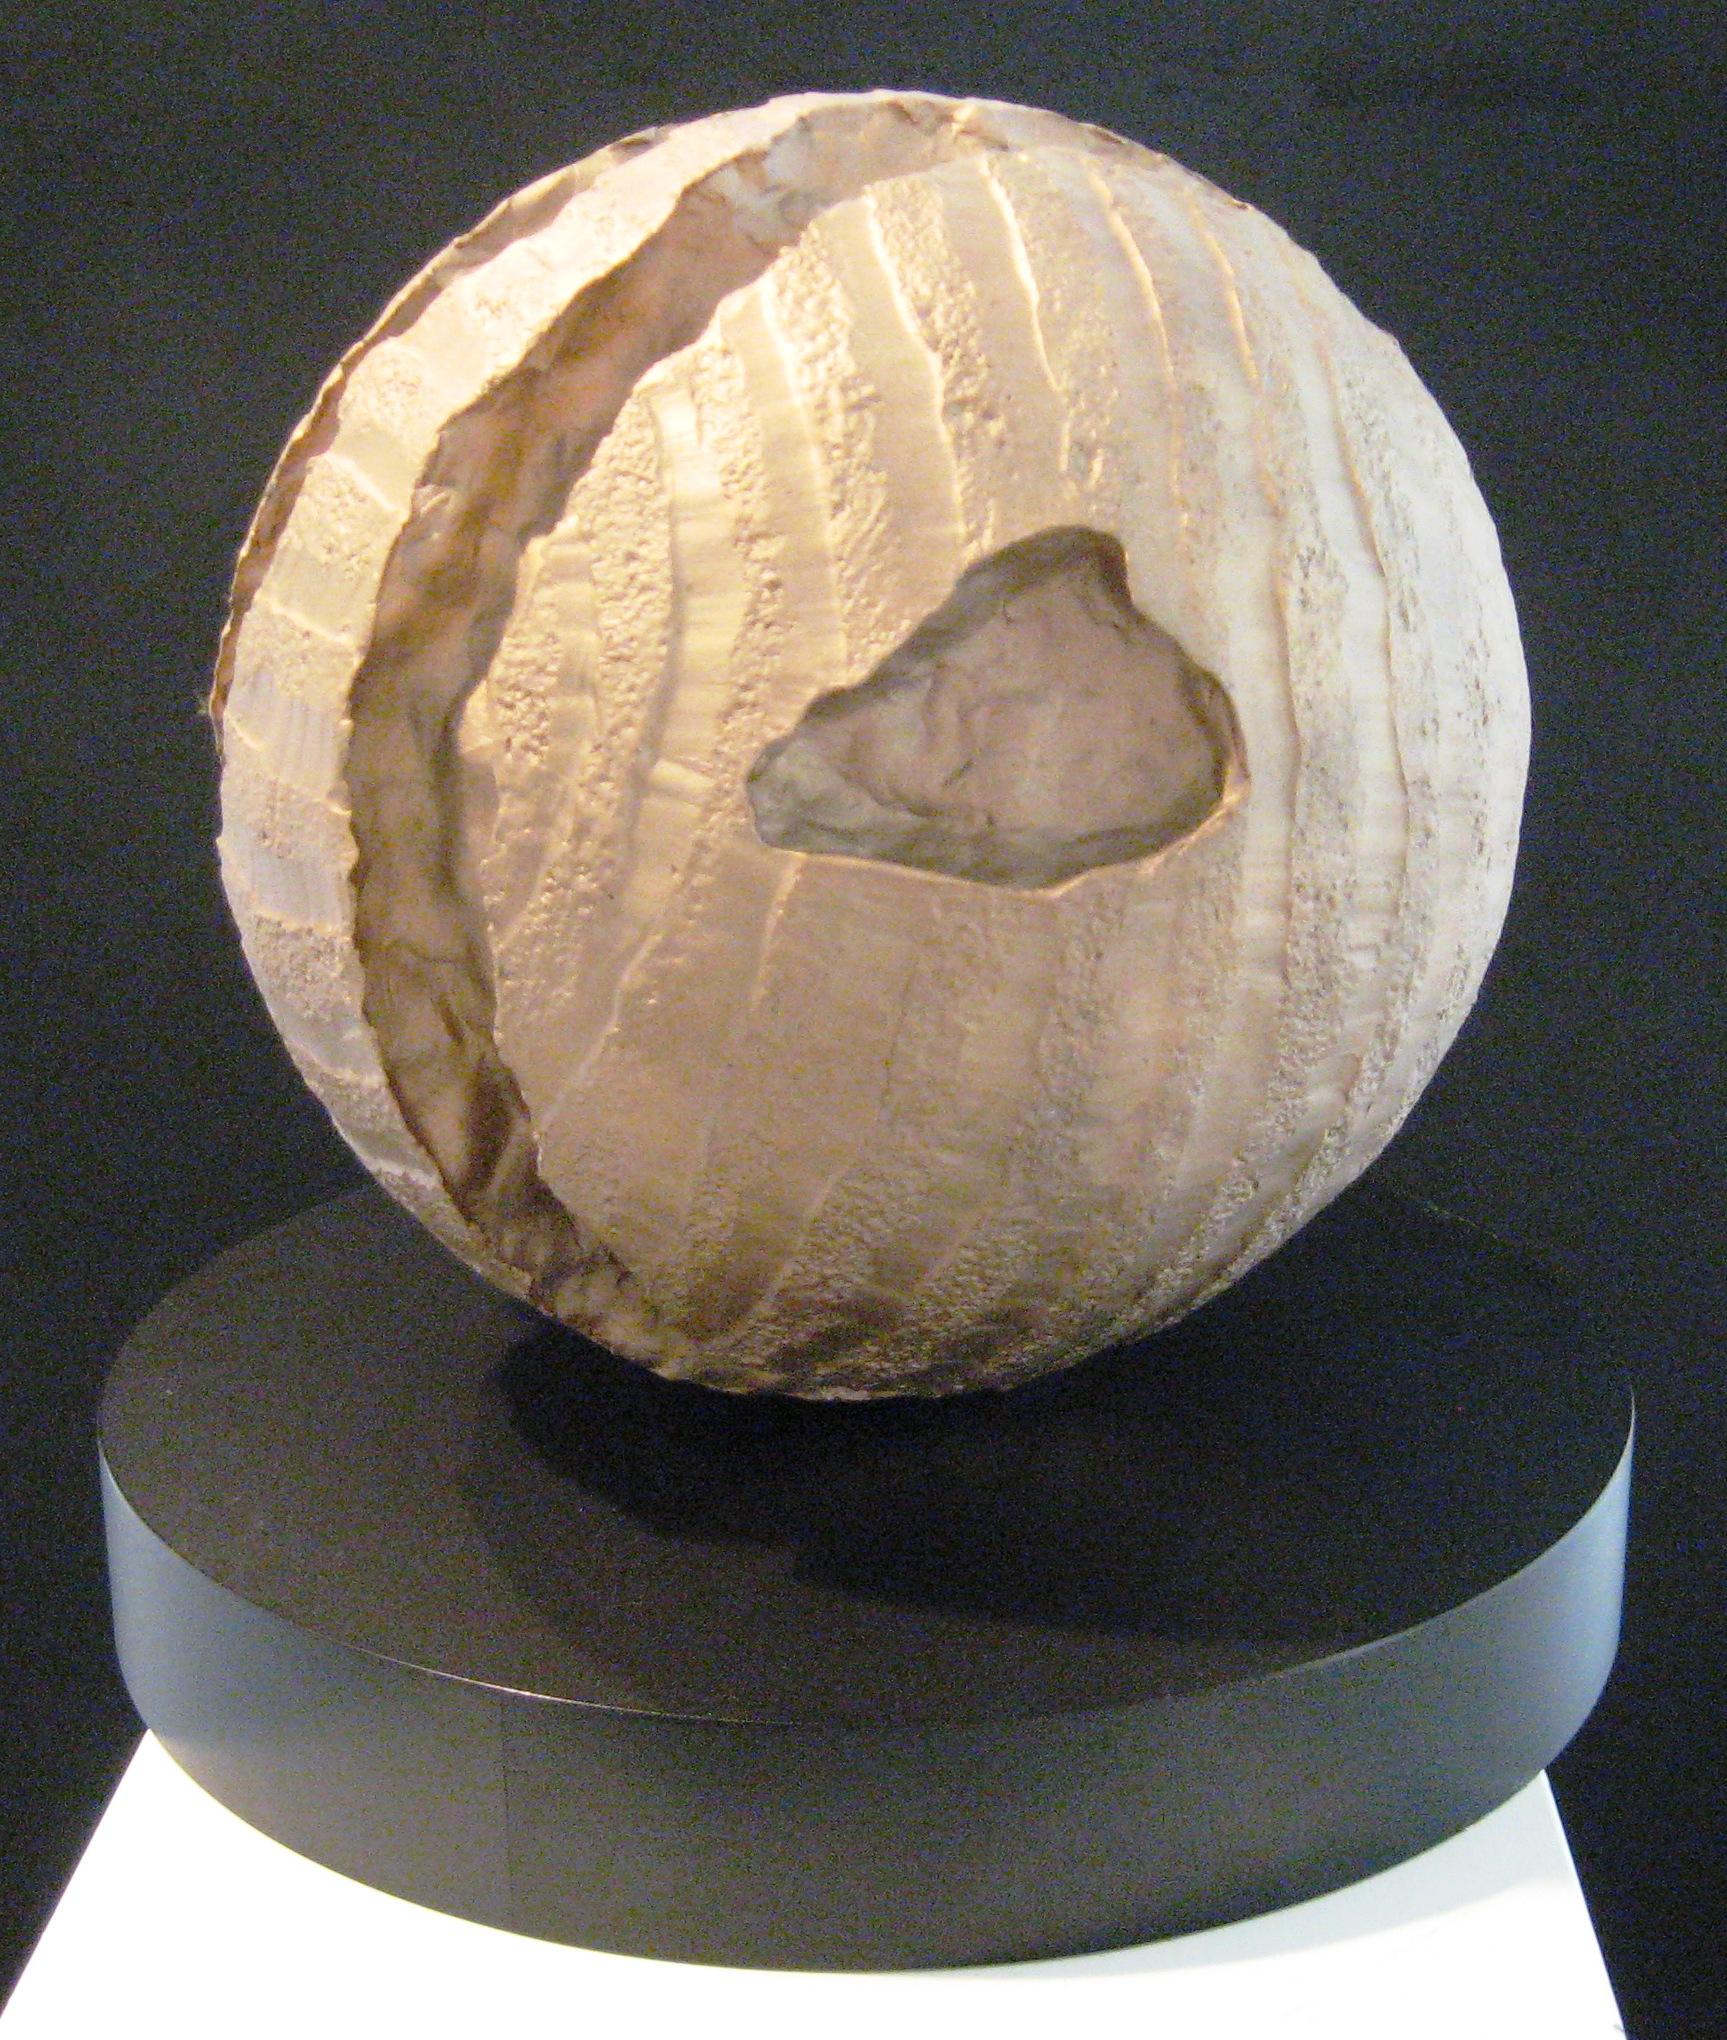 Circumsphere - view 2